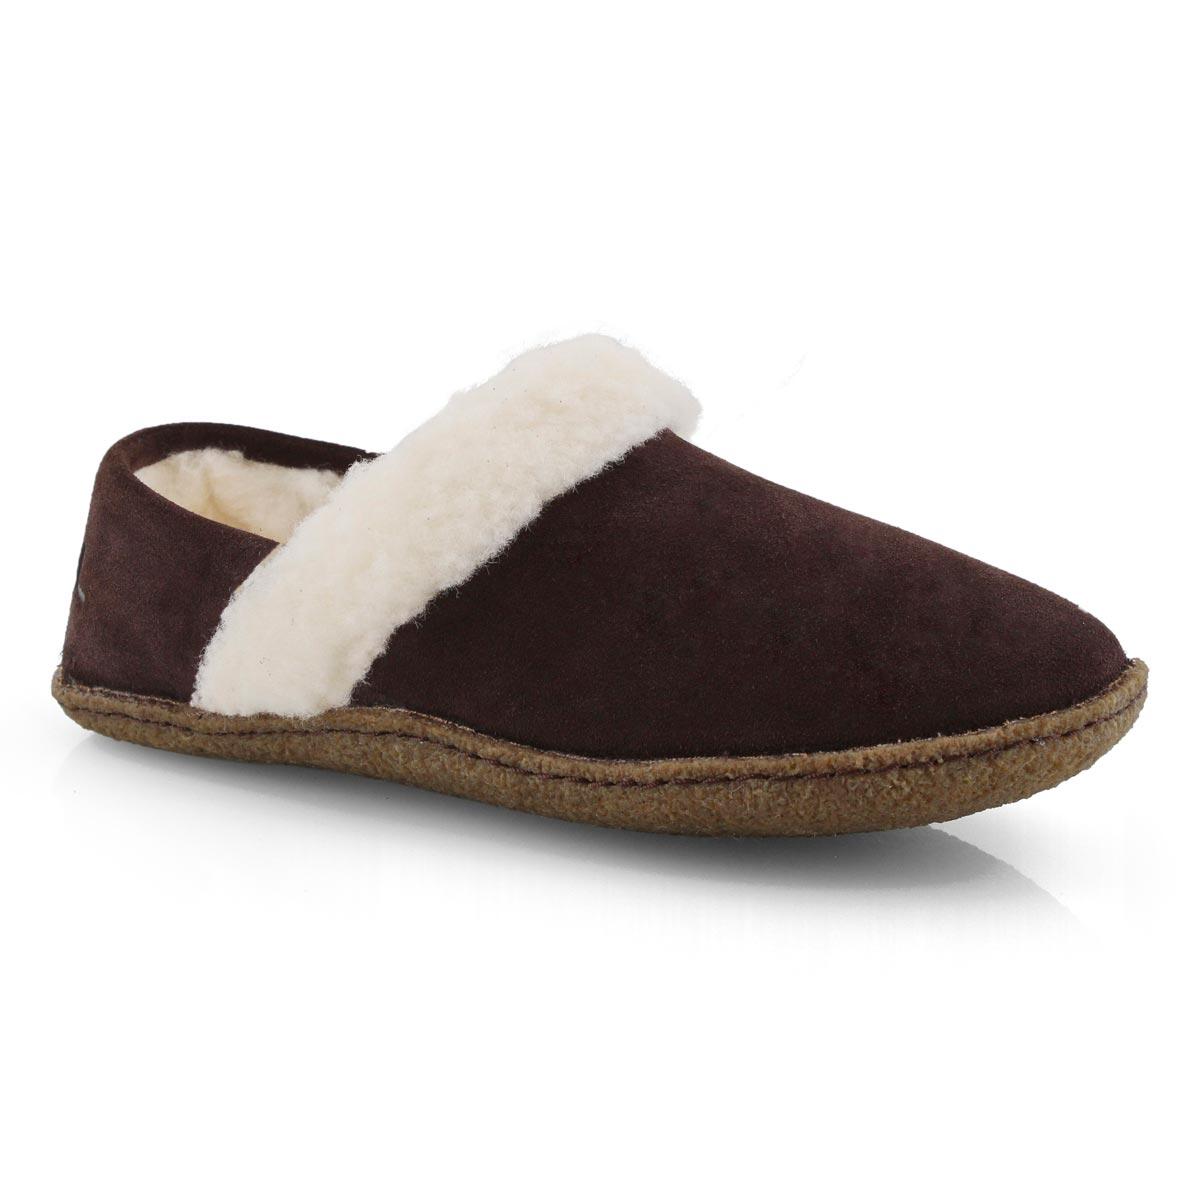 Lds Nakiska II brown slipper